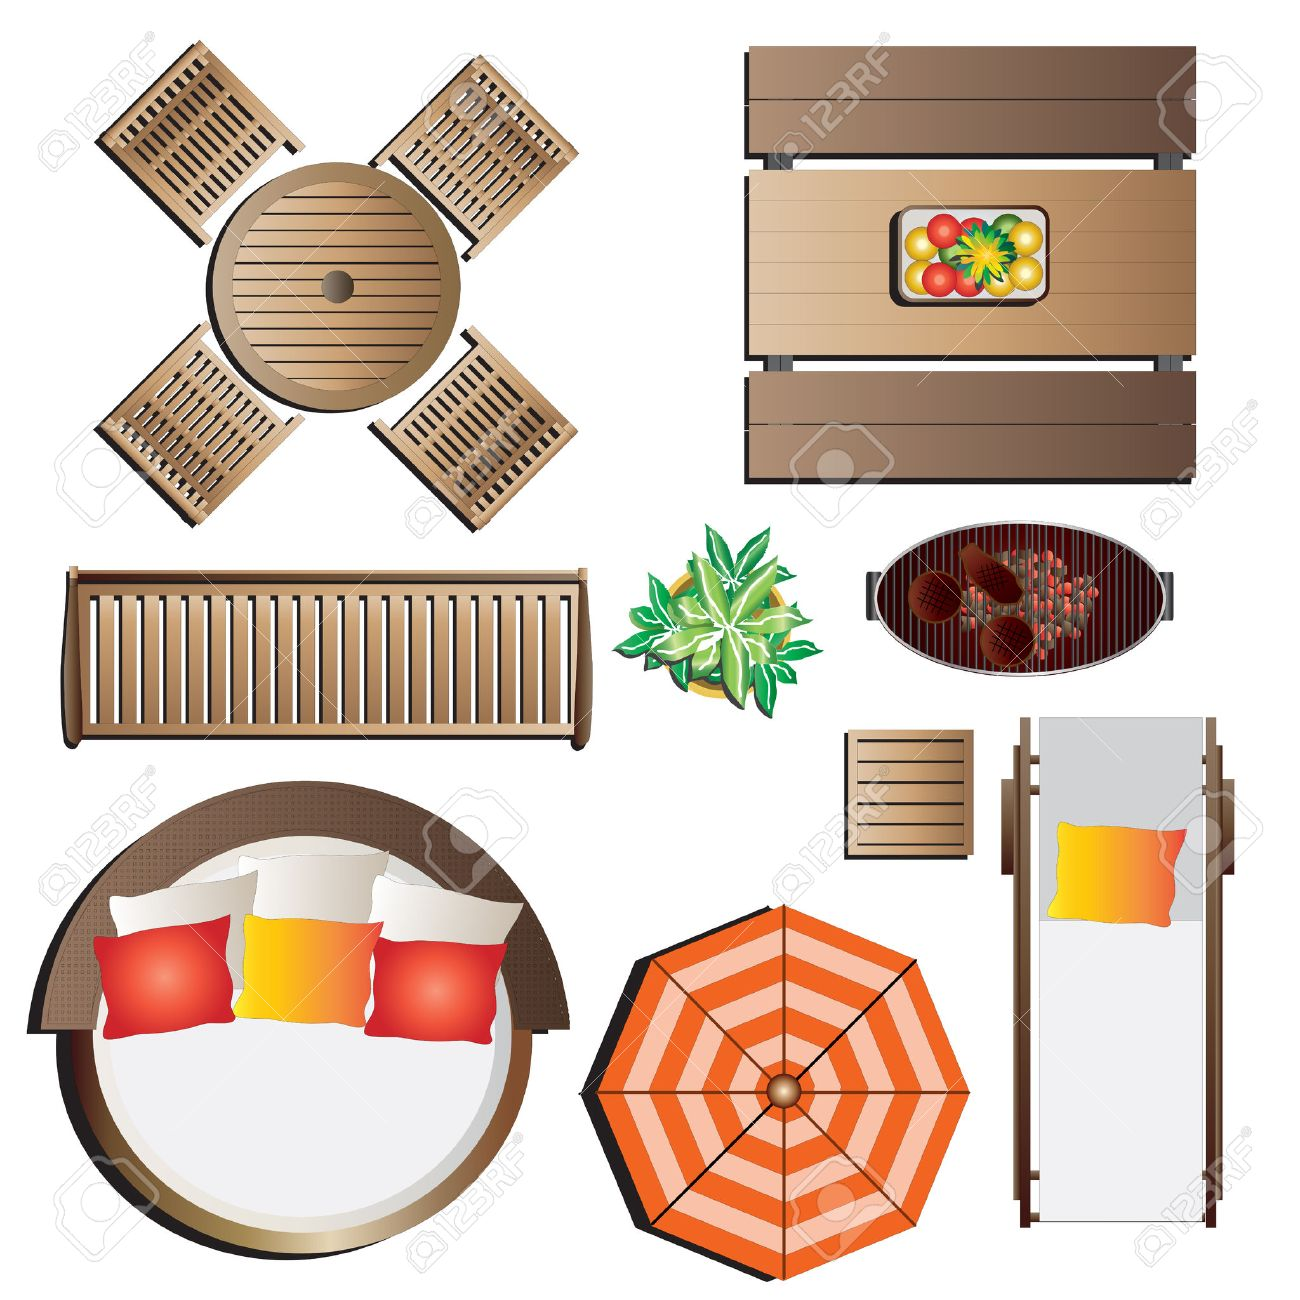 outdoor furniture top view set 13 for landscape design vector illustration stock vector 48756154